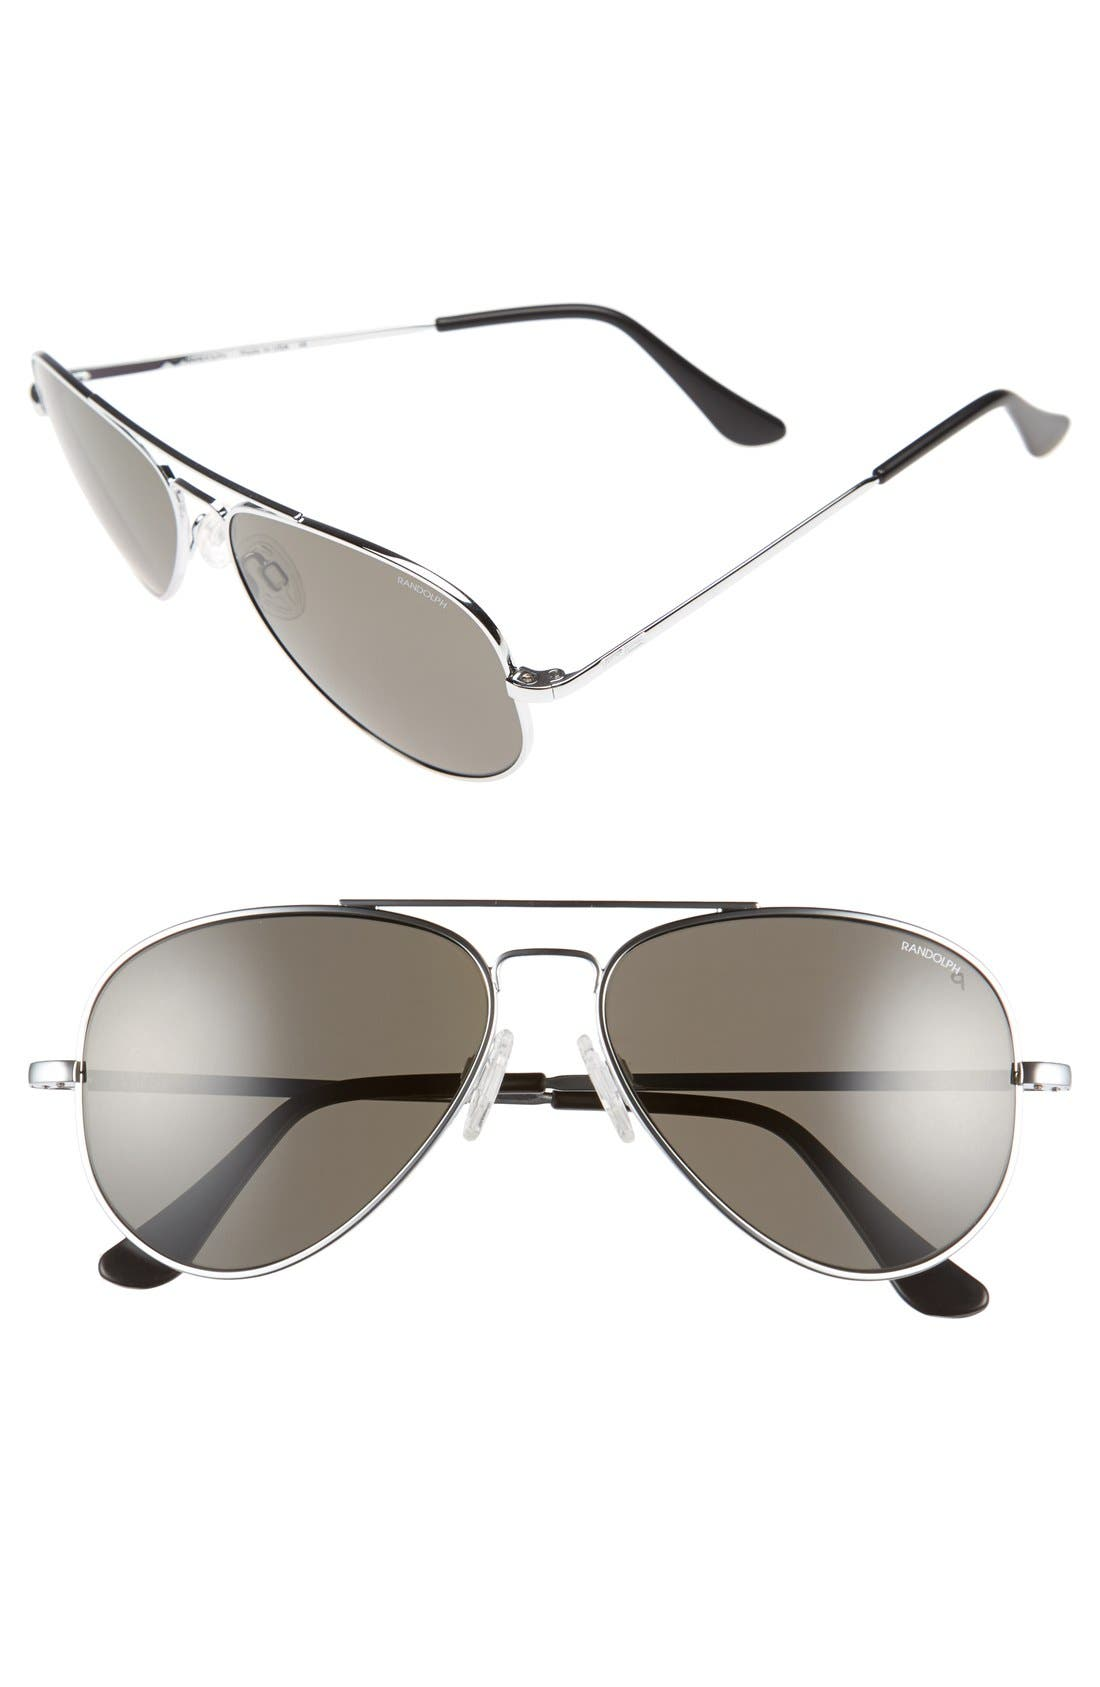 Randolph Engineering 'Concorde' 57mm Polarized Sunglasses